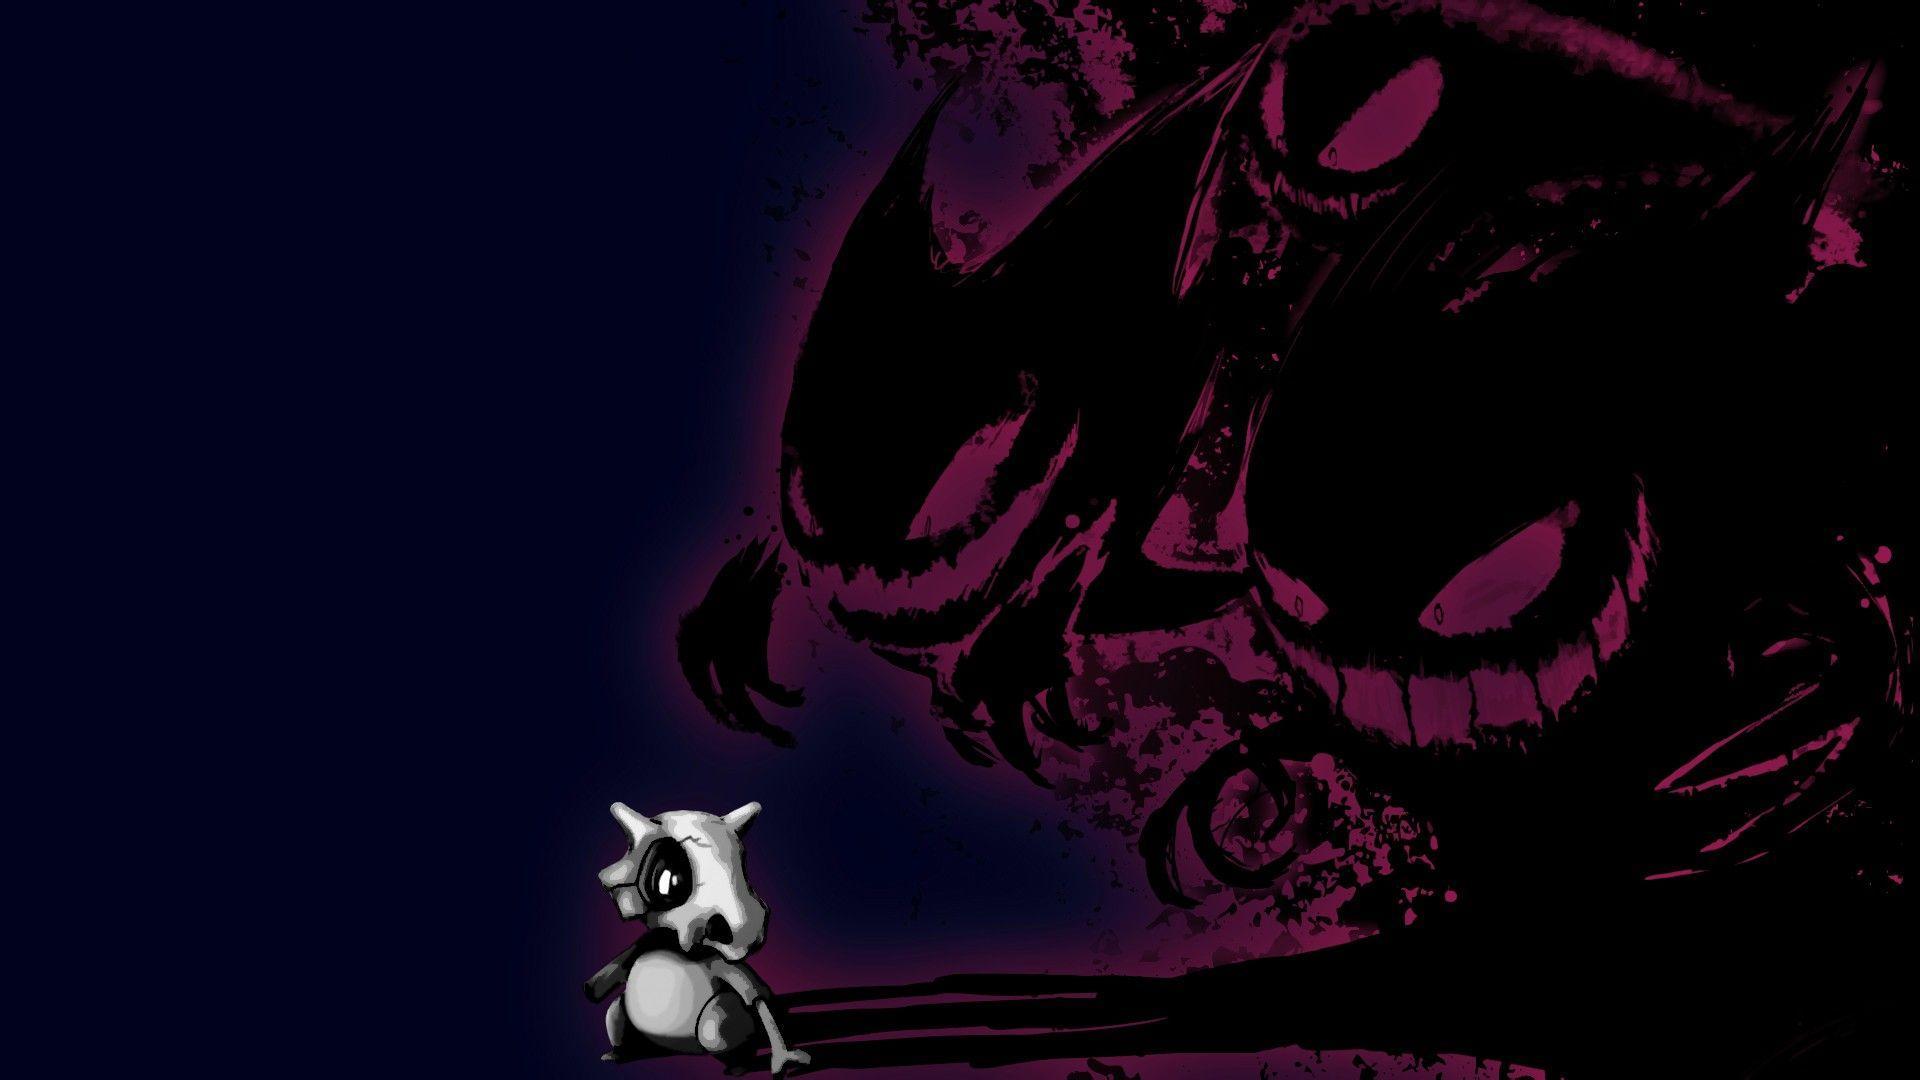 Dark pokemon wallpapers wallpaper cave - Pokemon ghost wallpaper ...